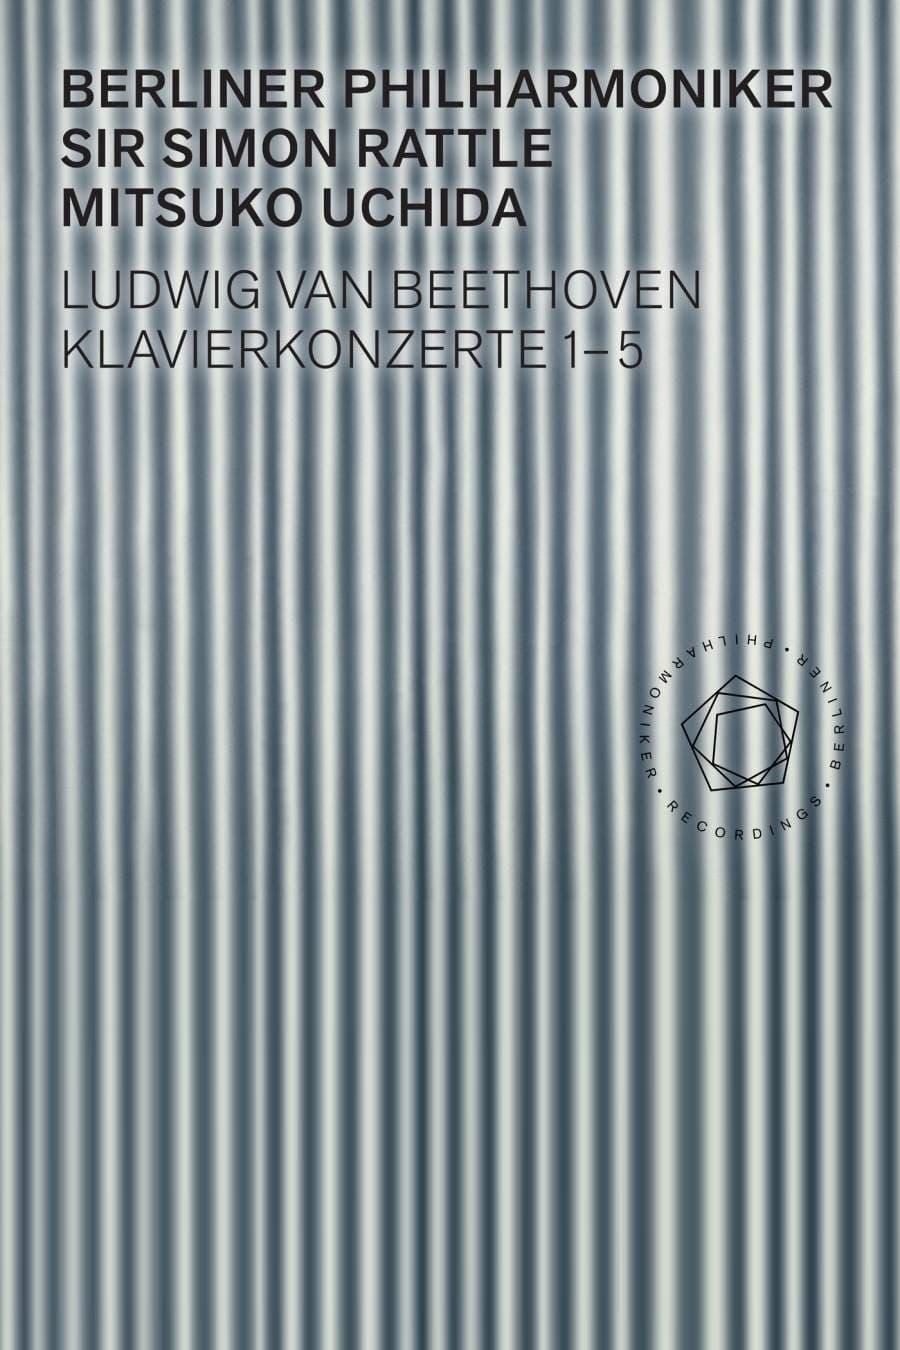 Beethoven: Piano Concertos 1-5 - Uchida, Rattle